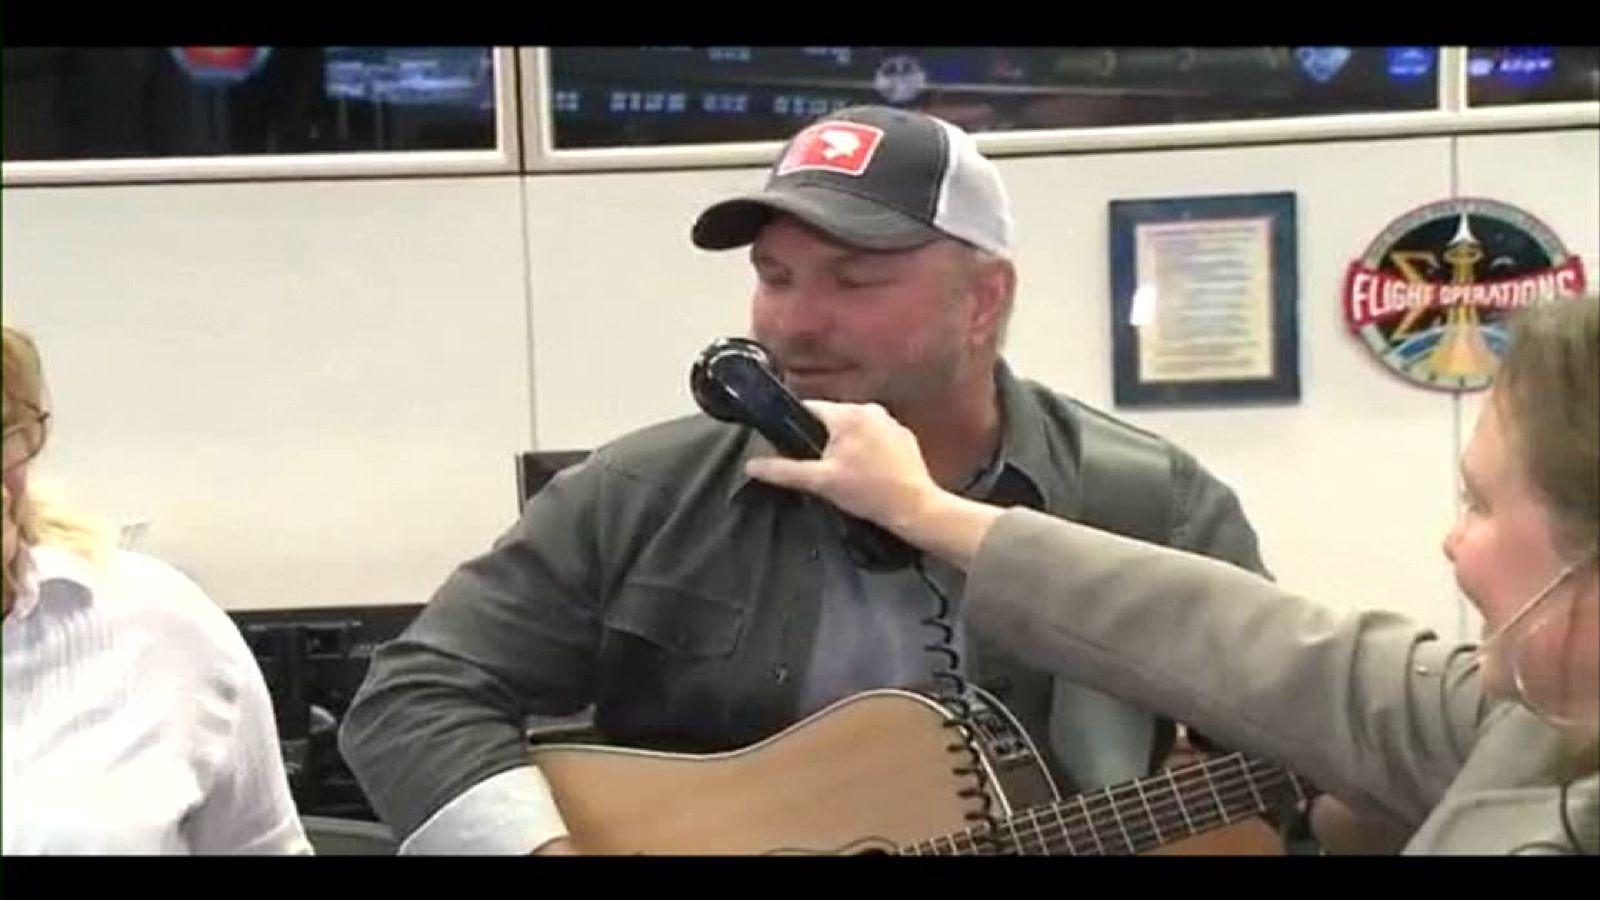 Garth Brooks sang The River, a favourite of astronaut Jack Fischer